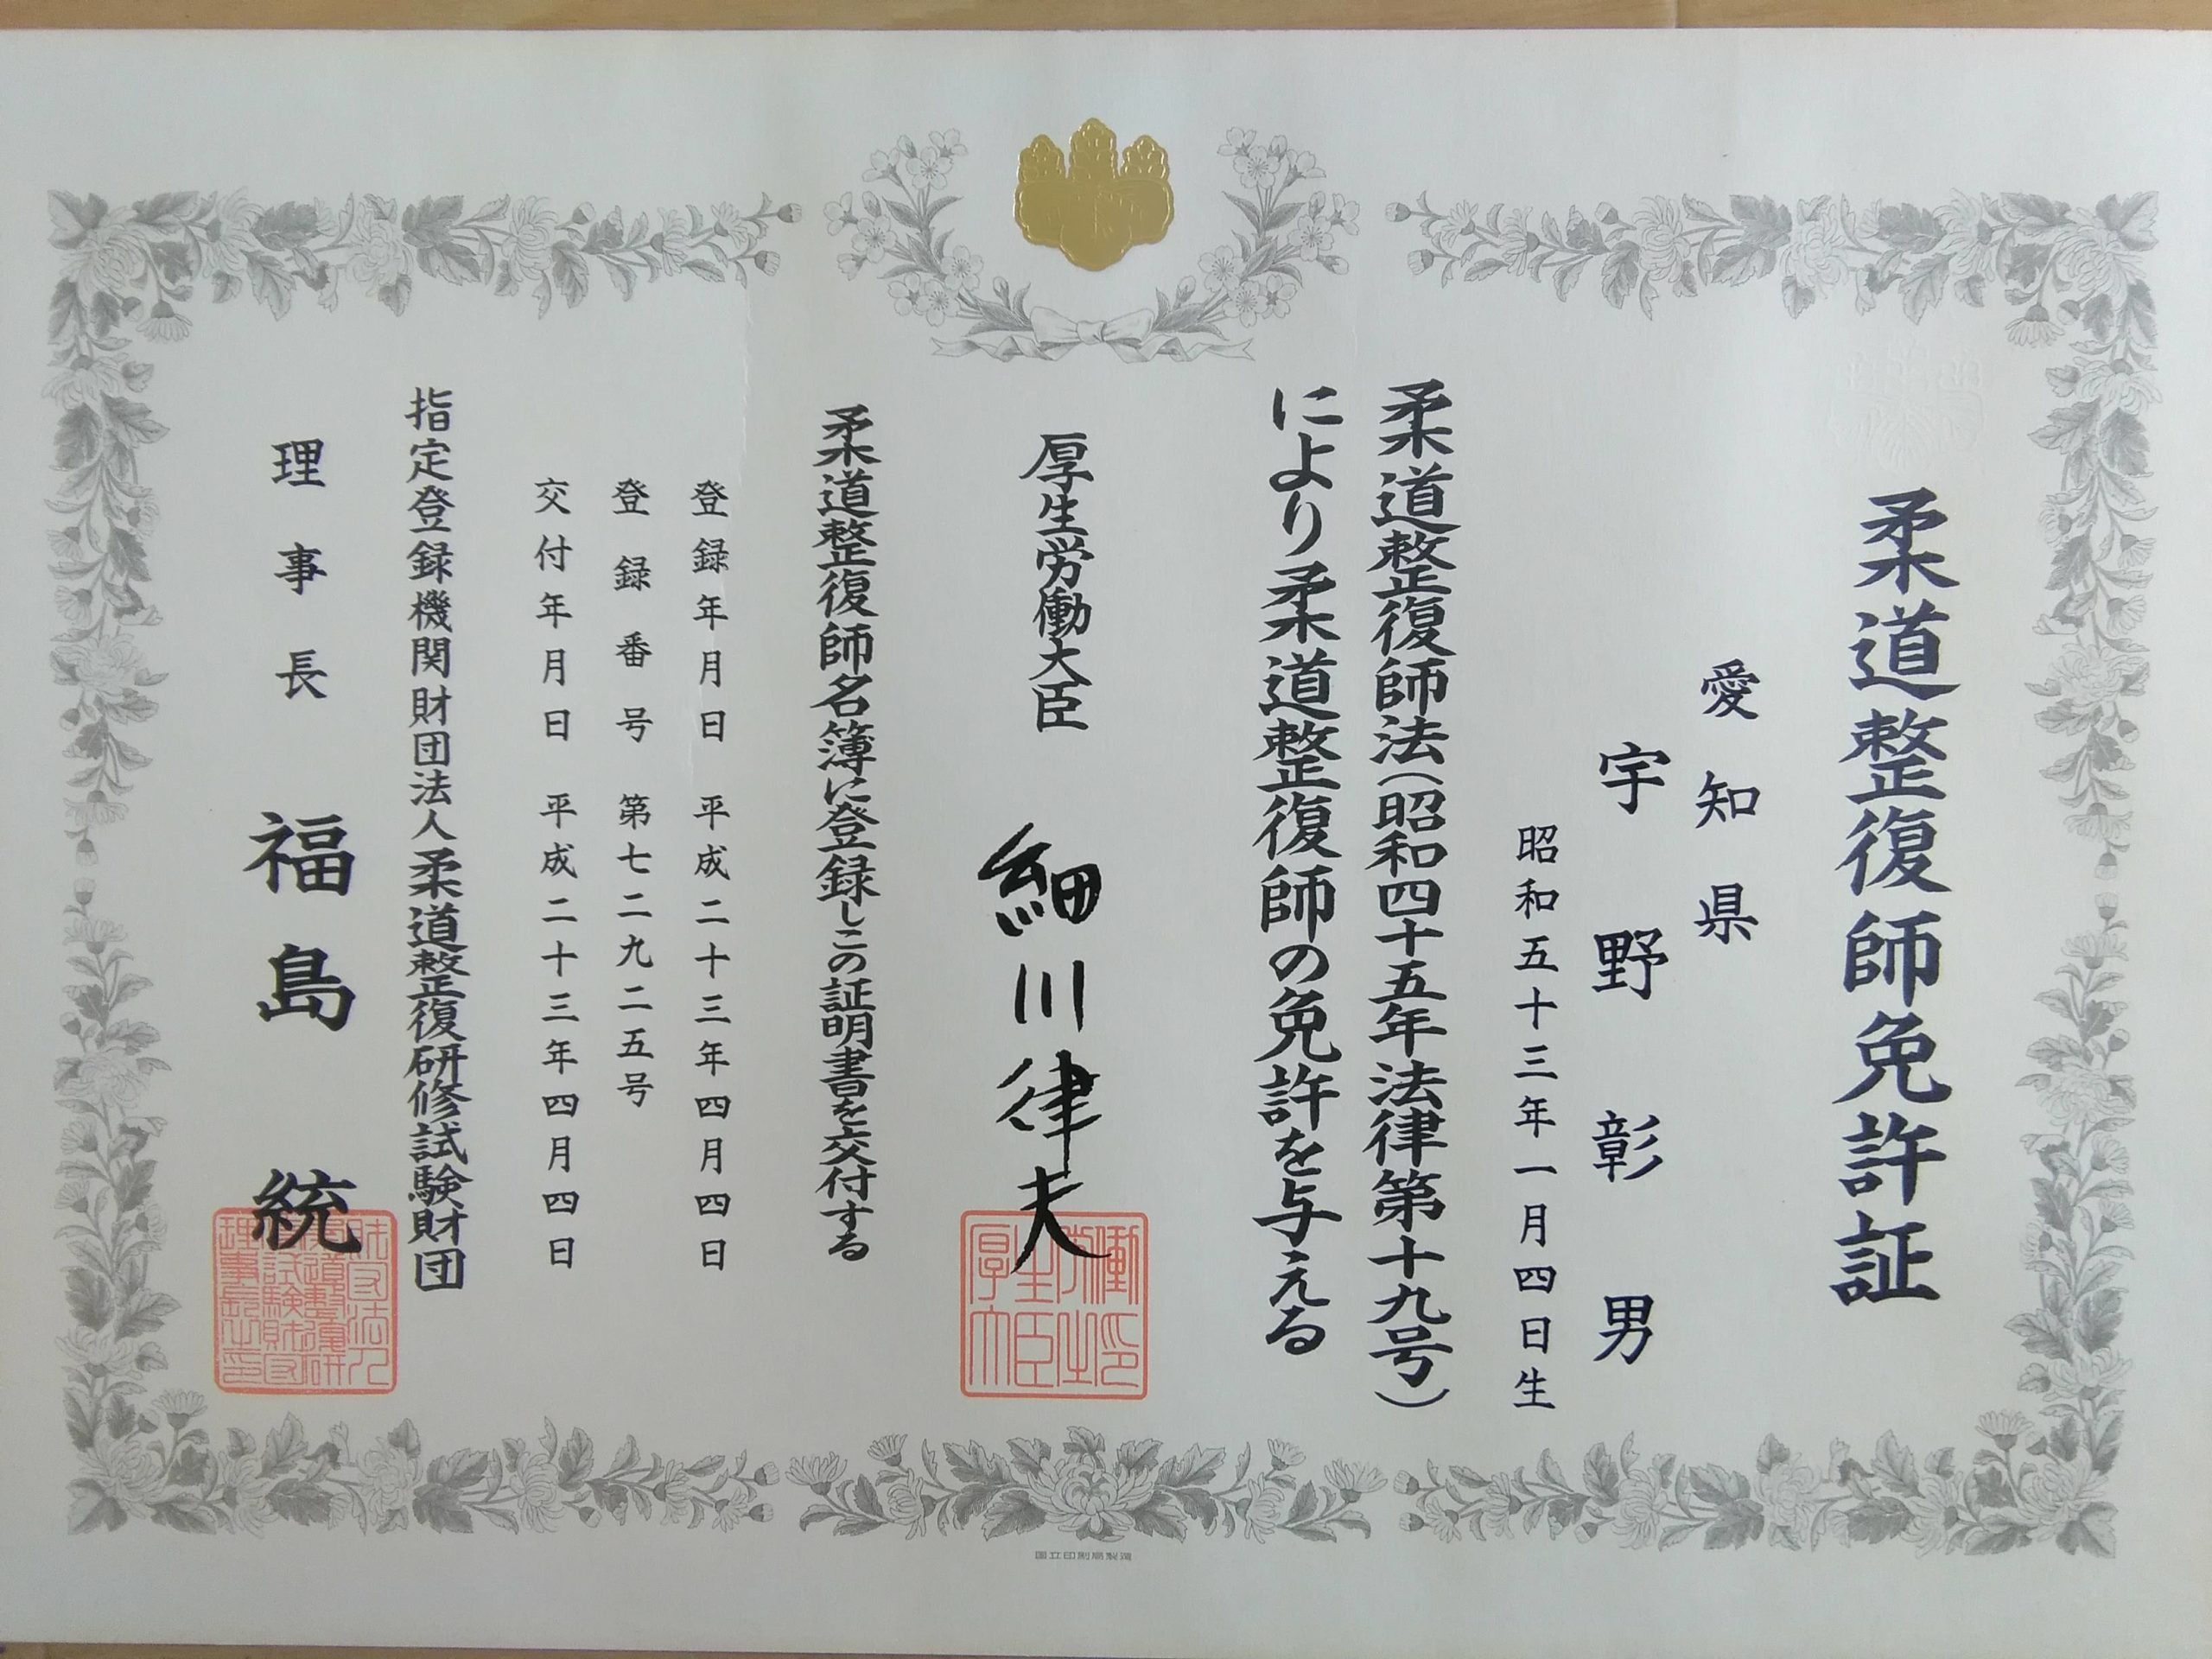 厚生労働省認定の柔道整復師免許